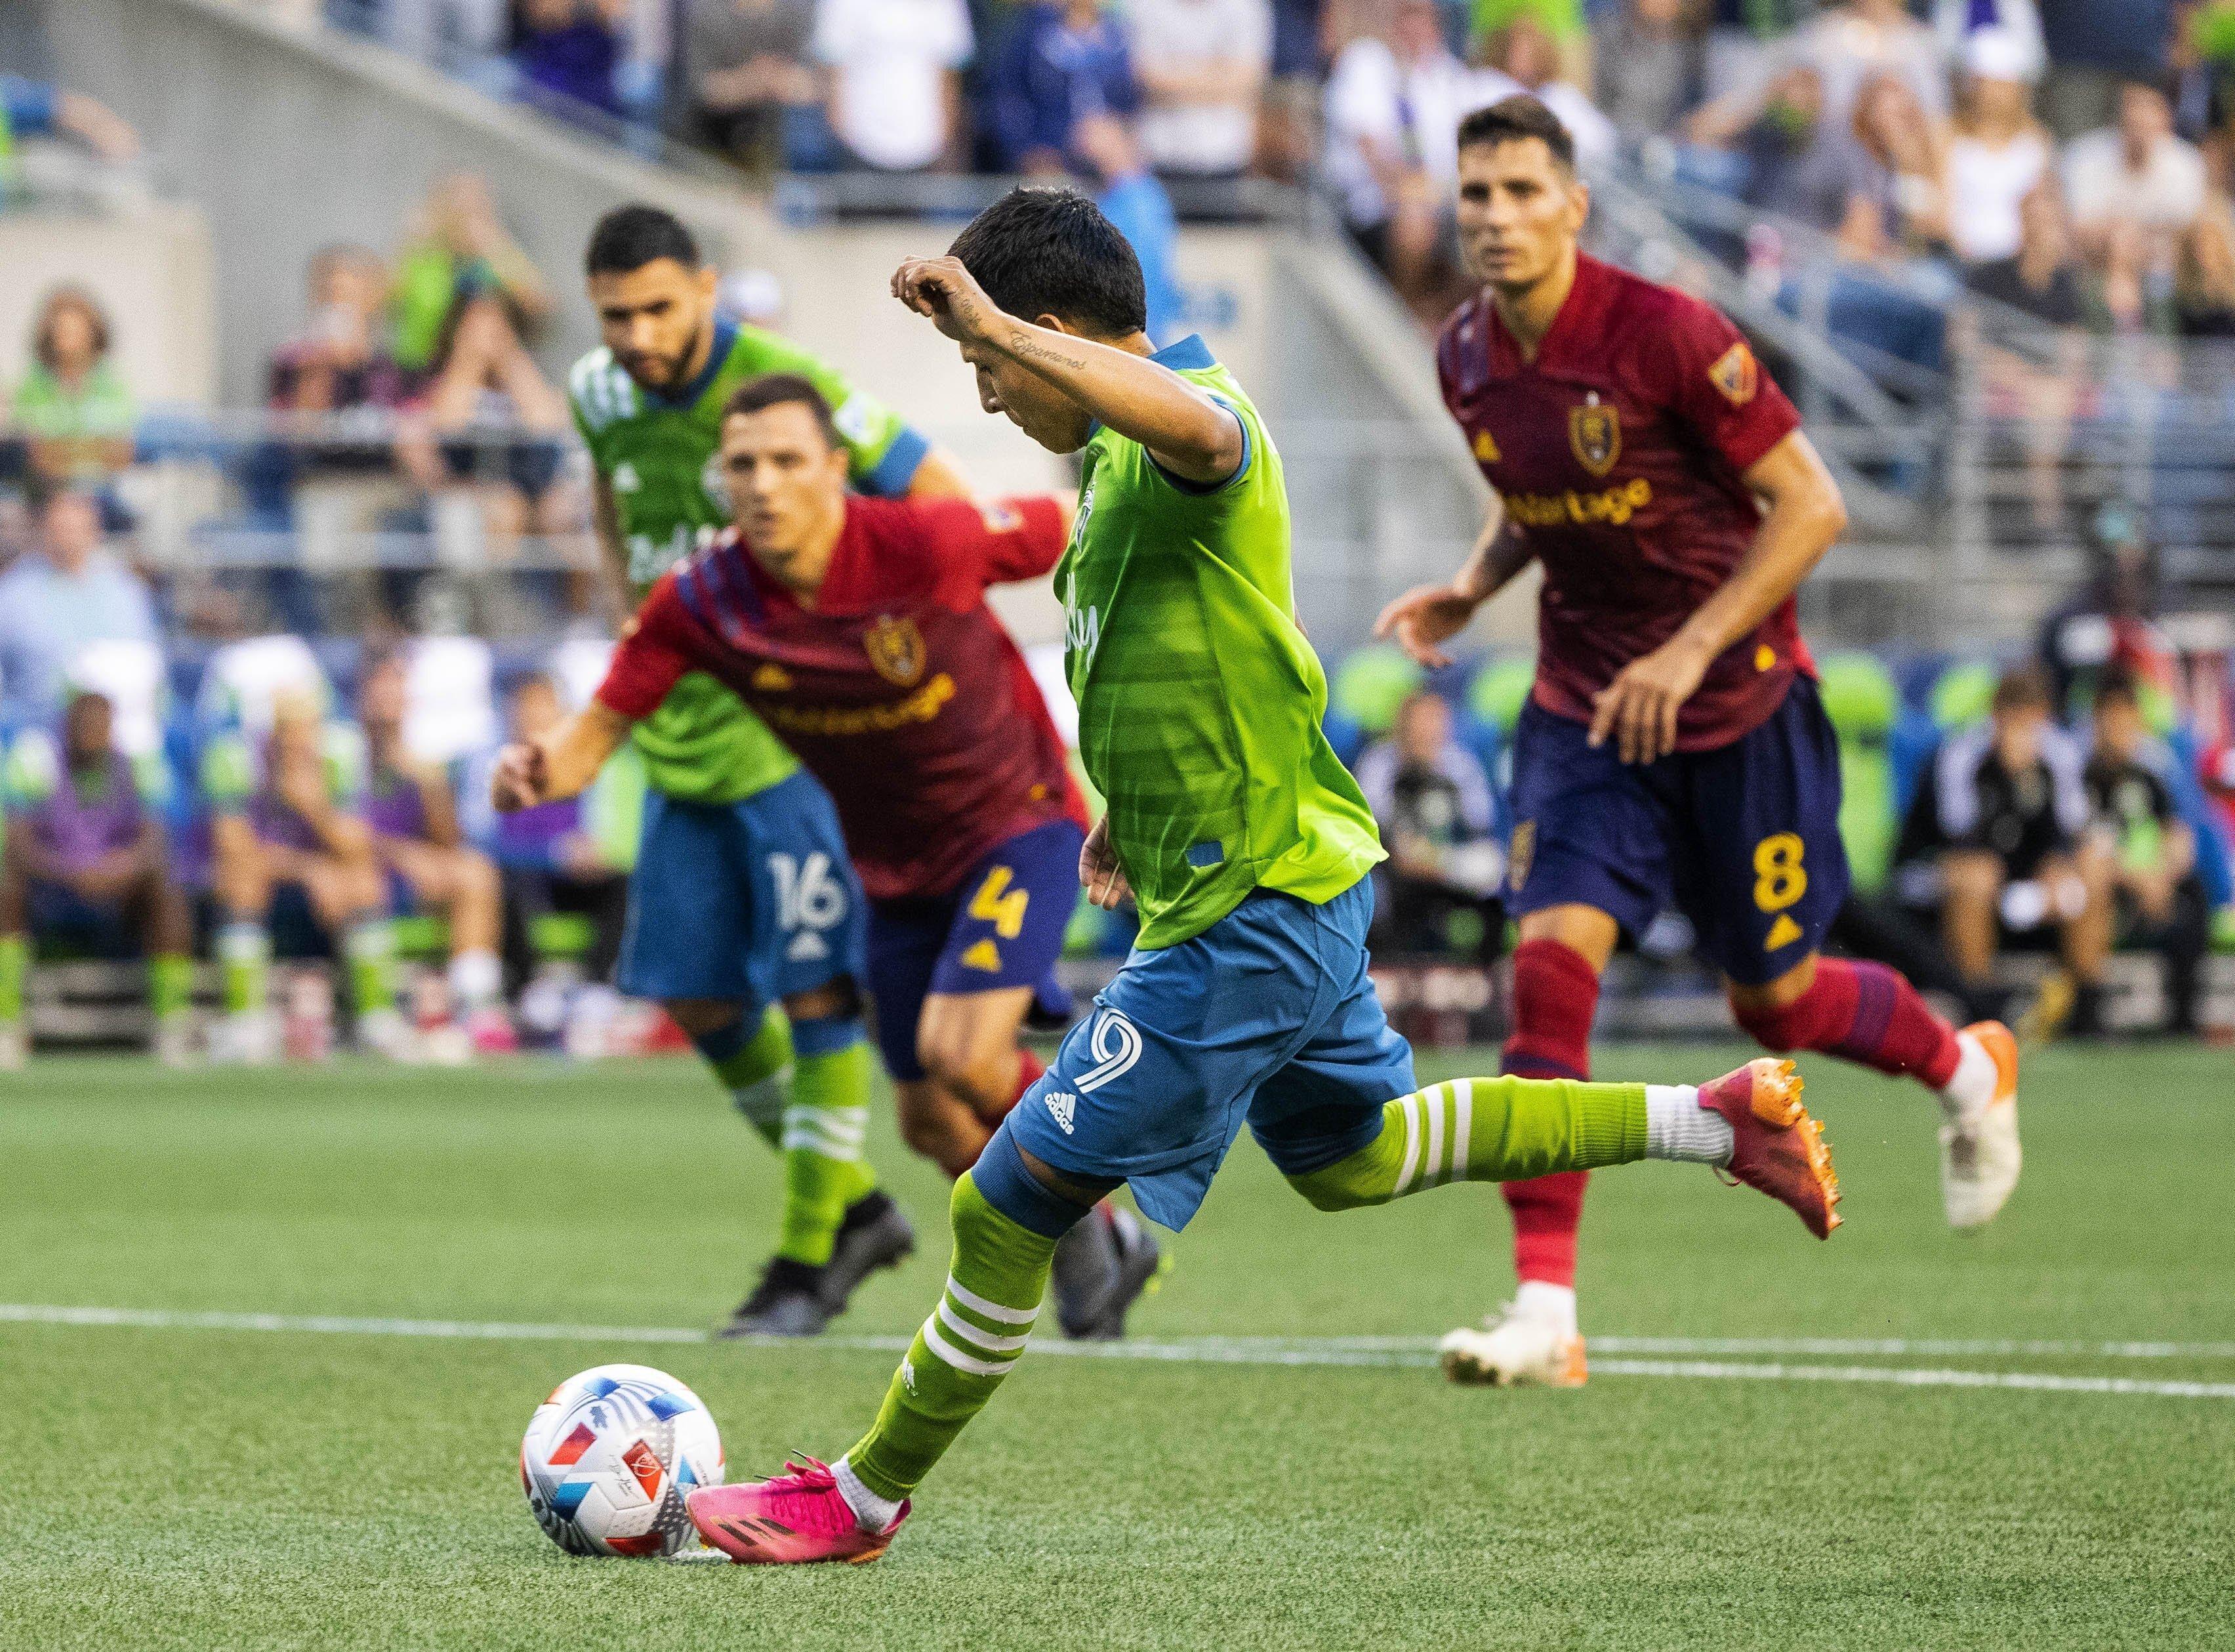 Seattle Sounders Raul Ruidiaz kicks the game-winning goal